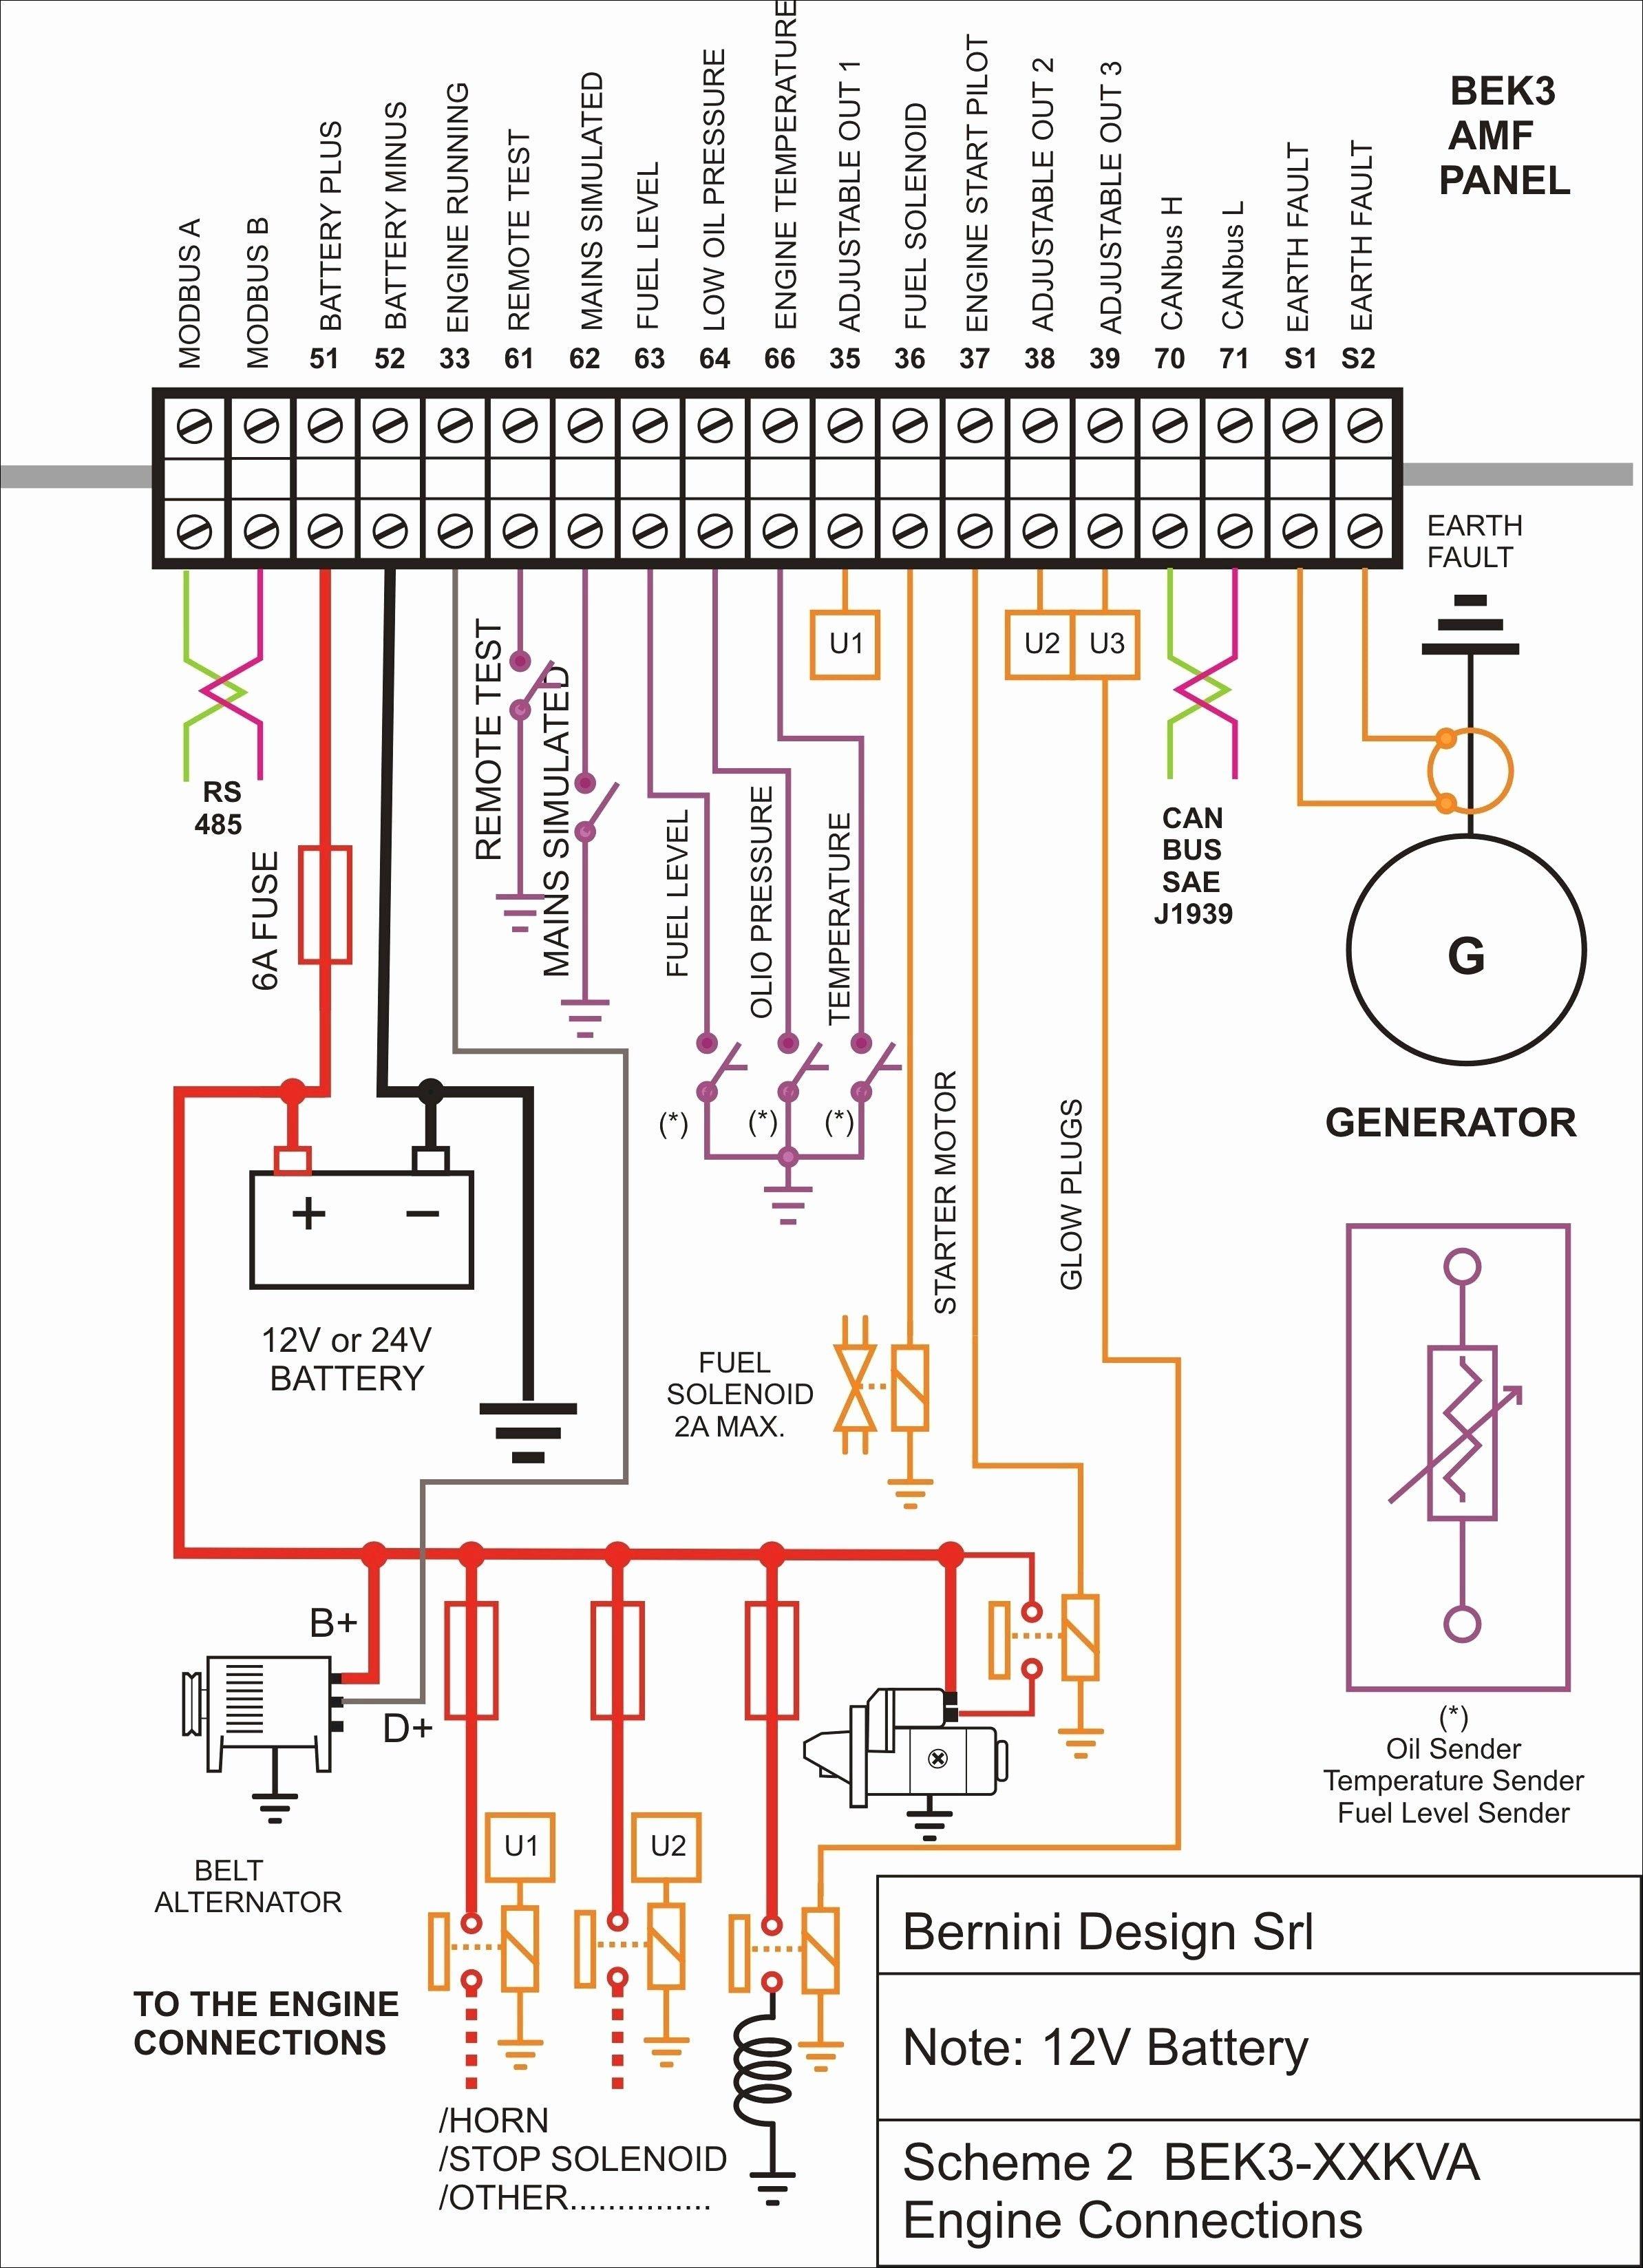 Mopar Wiring Diagram In 2020 Electrical Circuit Diagram Electrical Panel Wiring Electrical Wiring Diagram